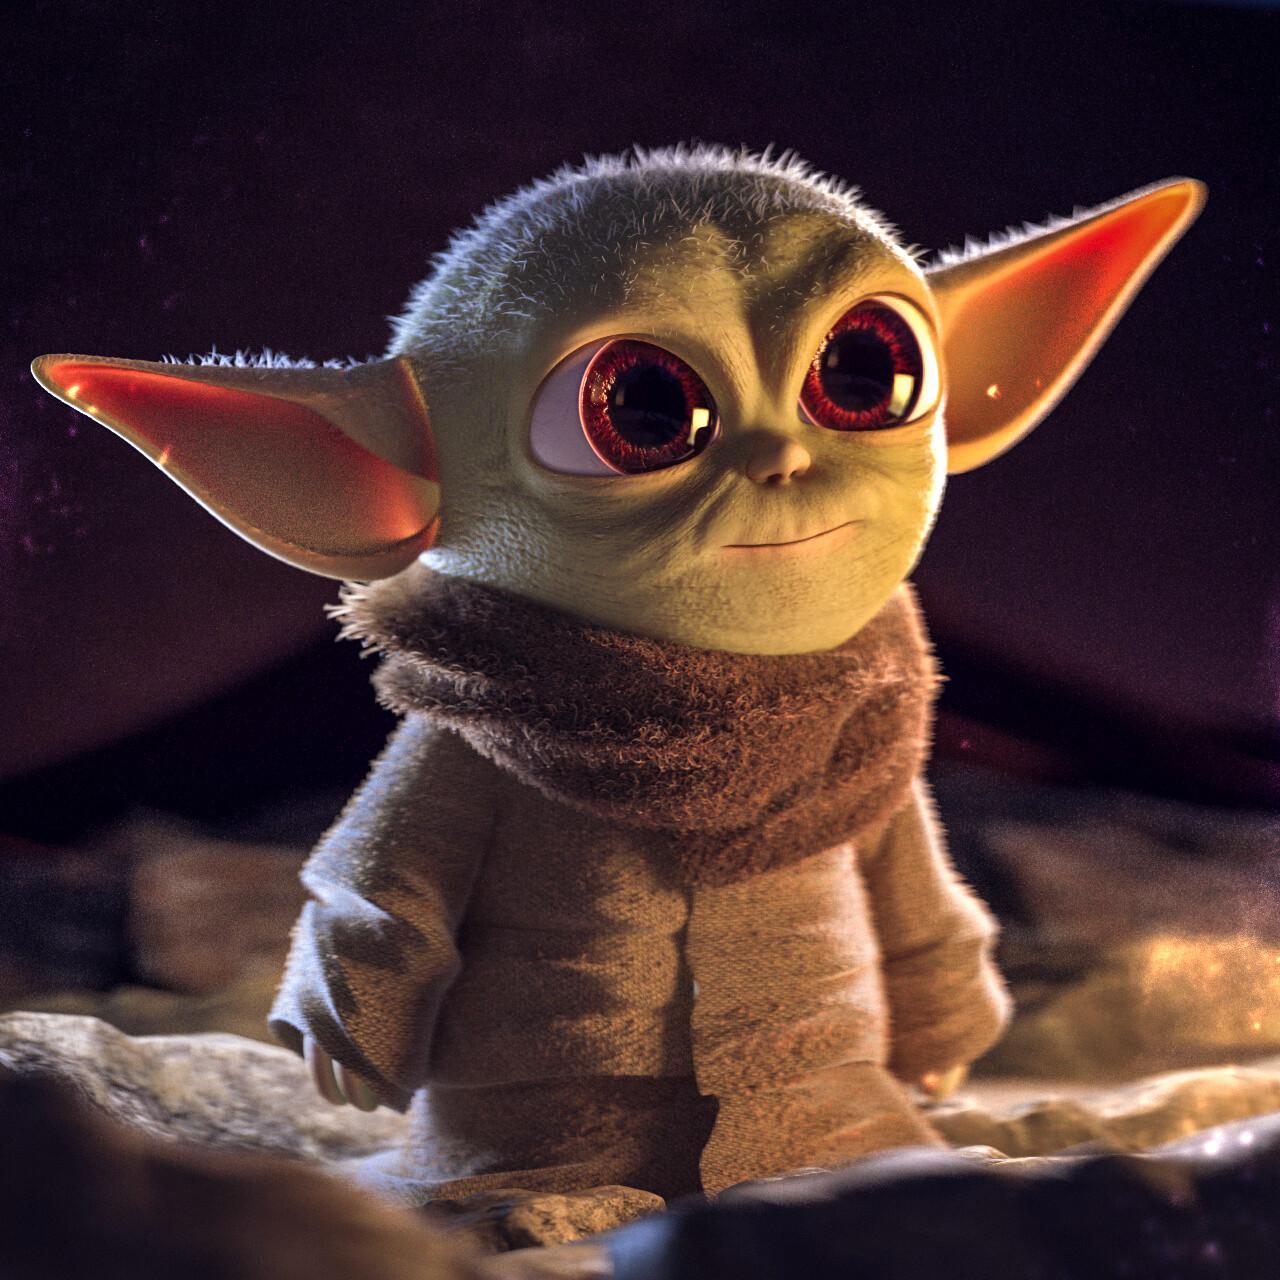 David Alvarez Baby Yoda Fan Art